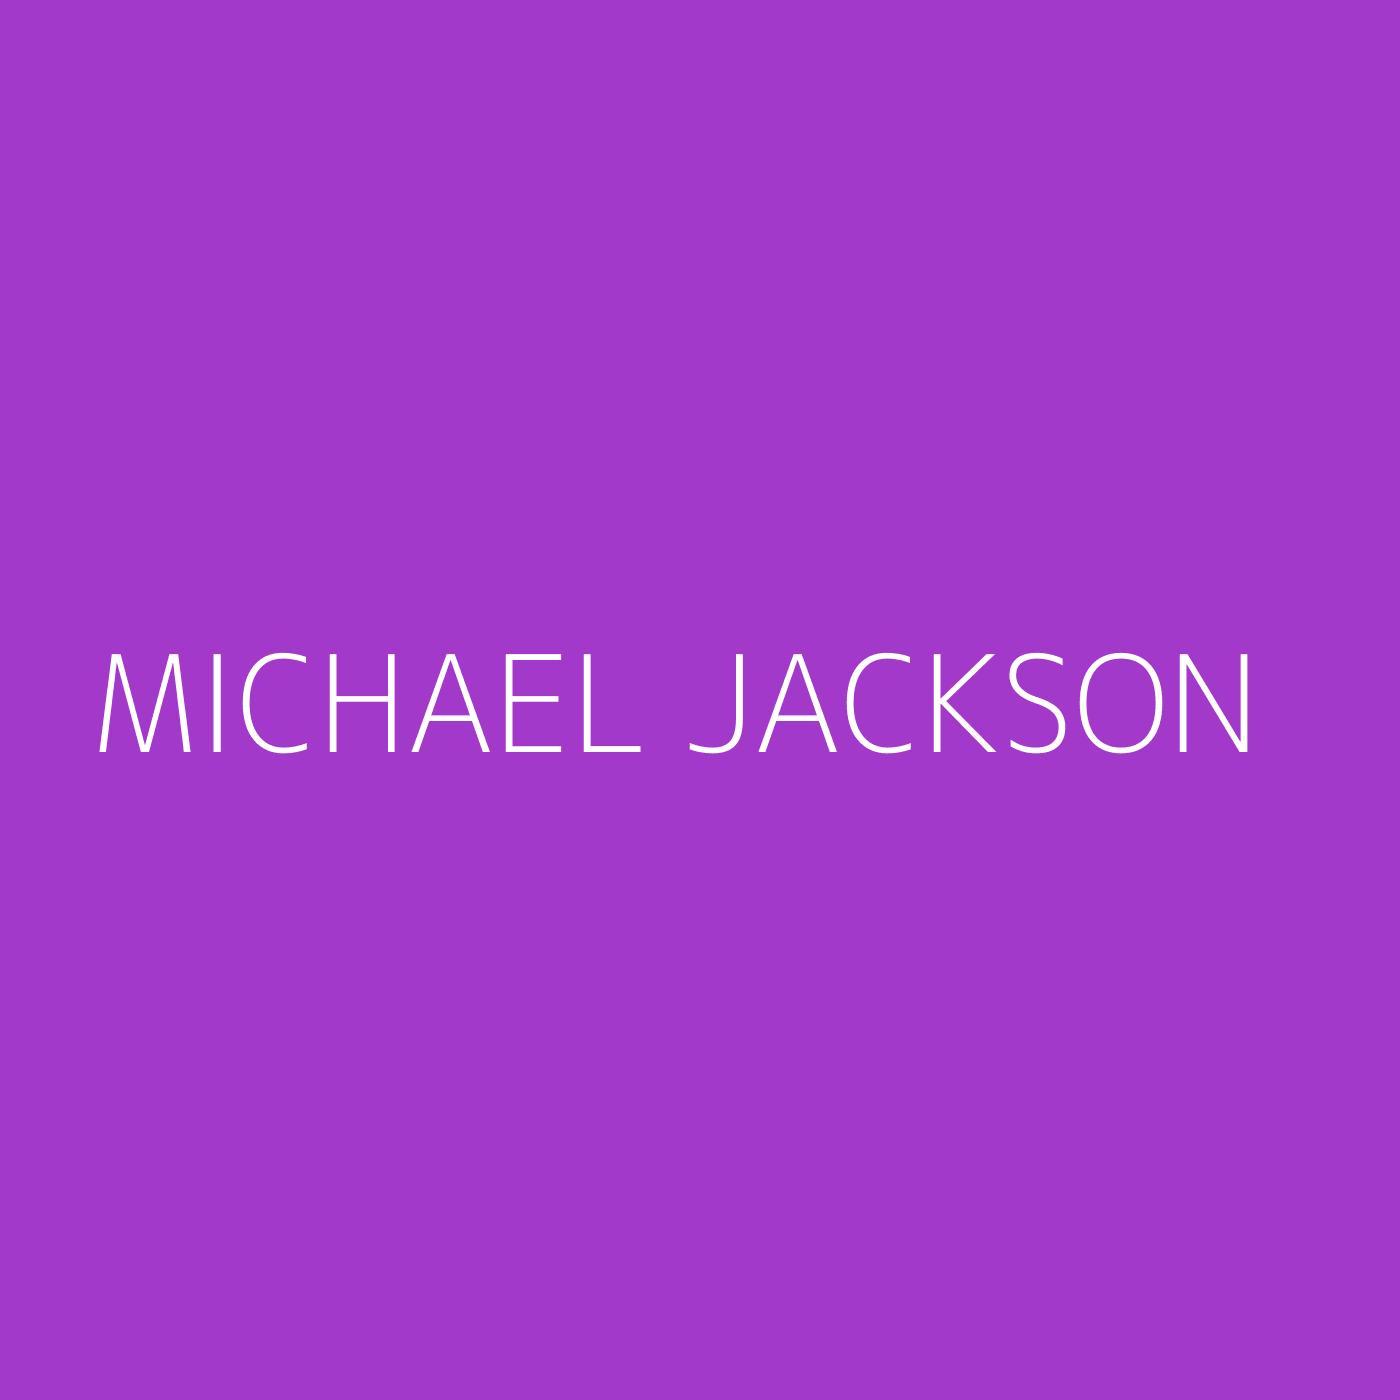 Michael Jackson Playlist Artwork